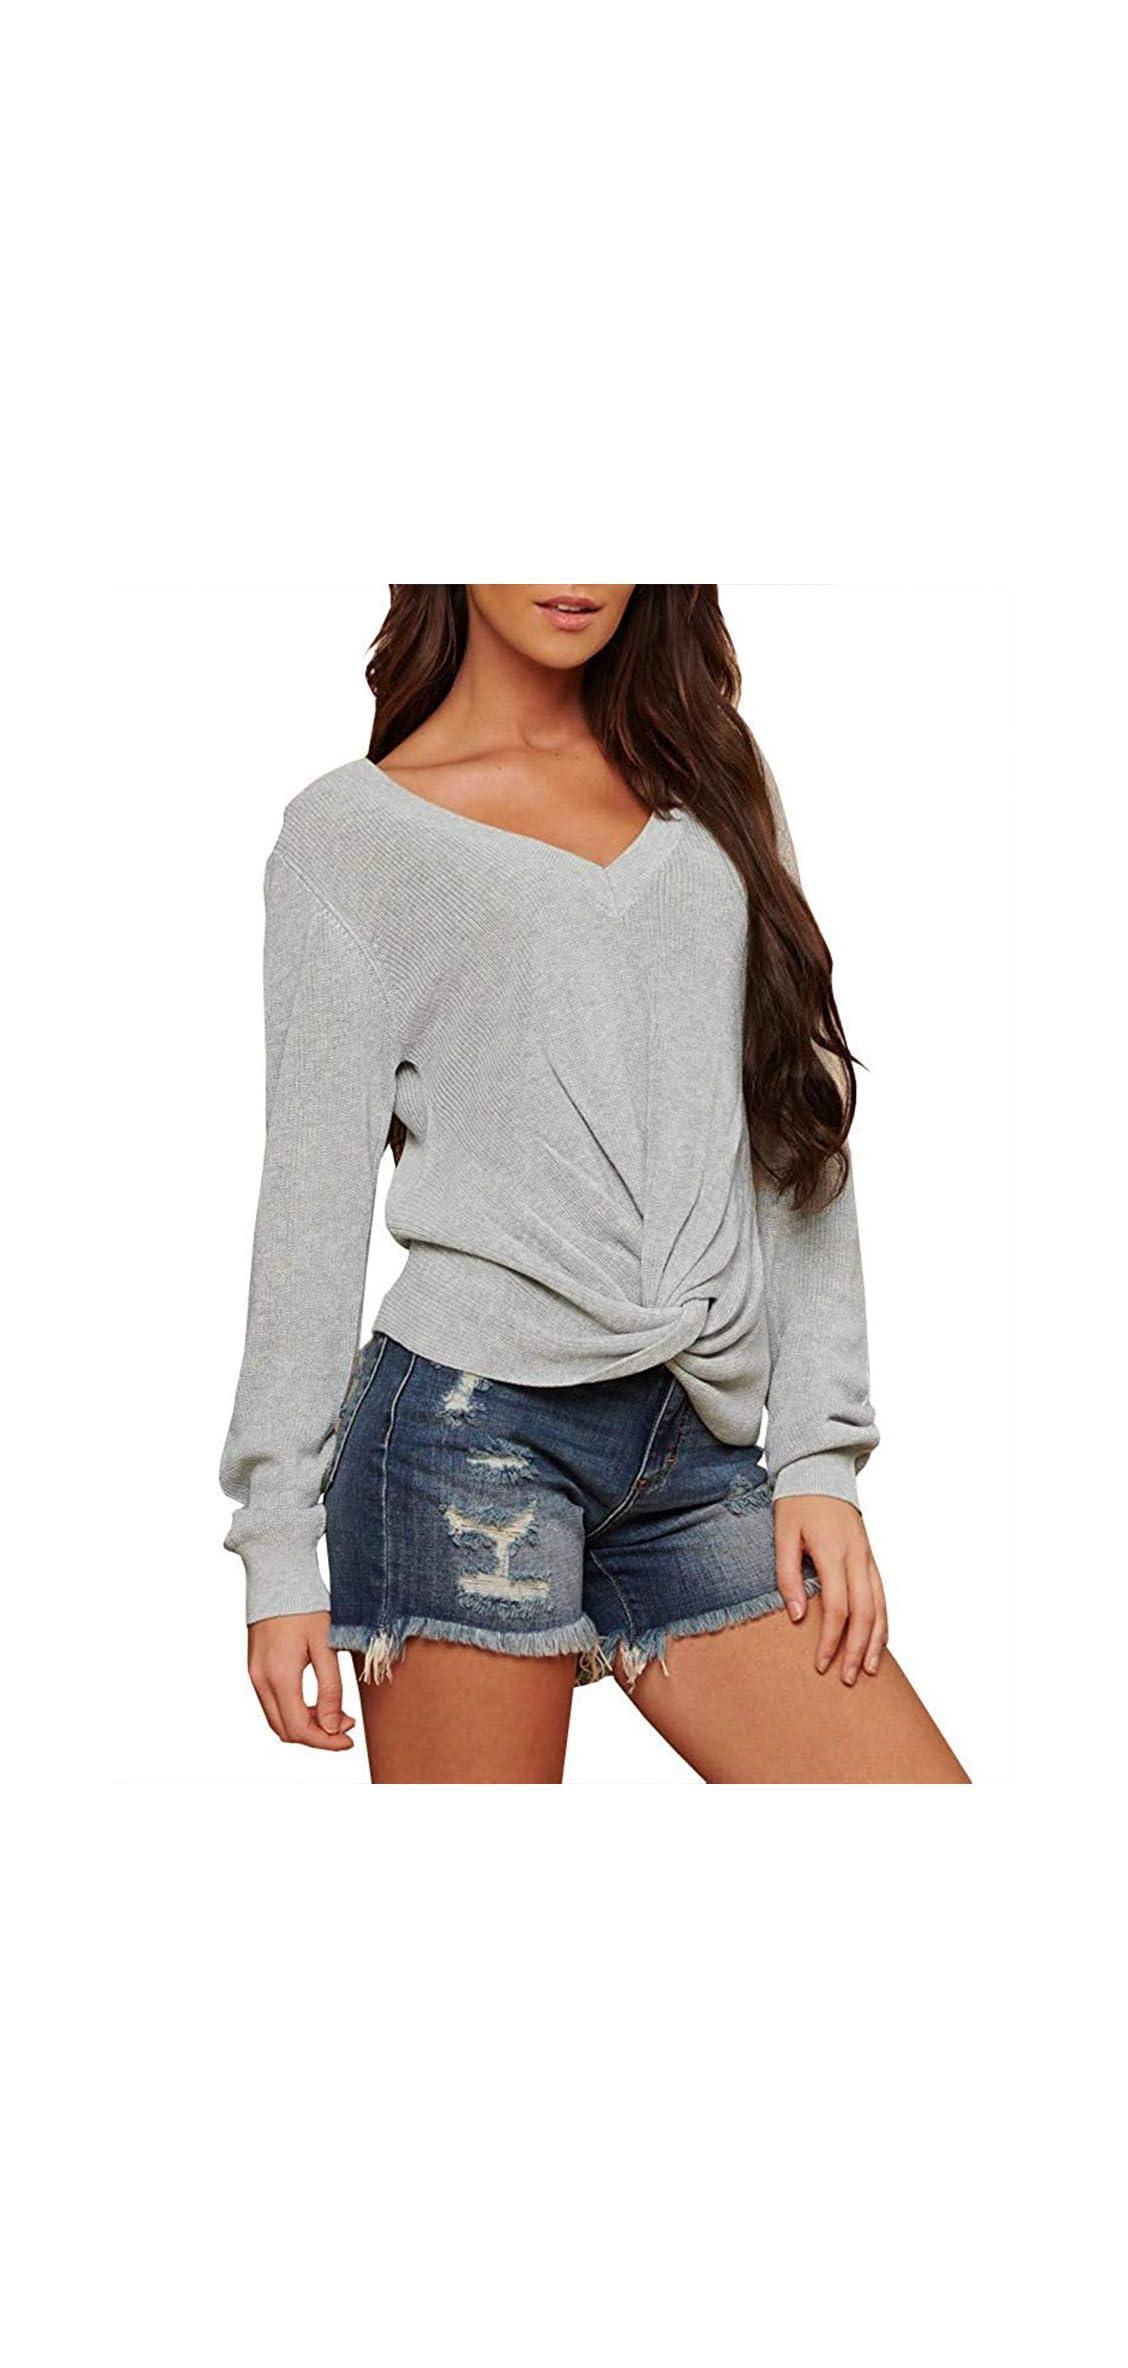 Womens Fall Basic Long Sleeve V Neck T-shirts Casual